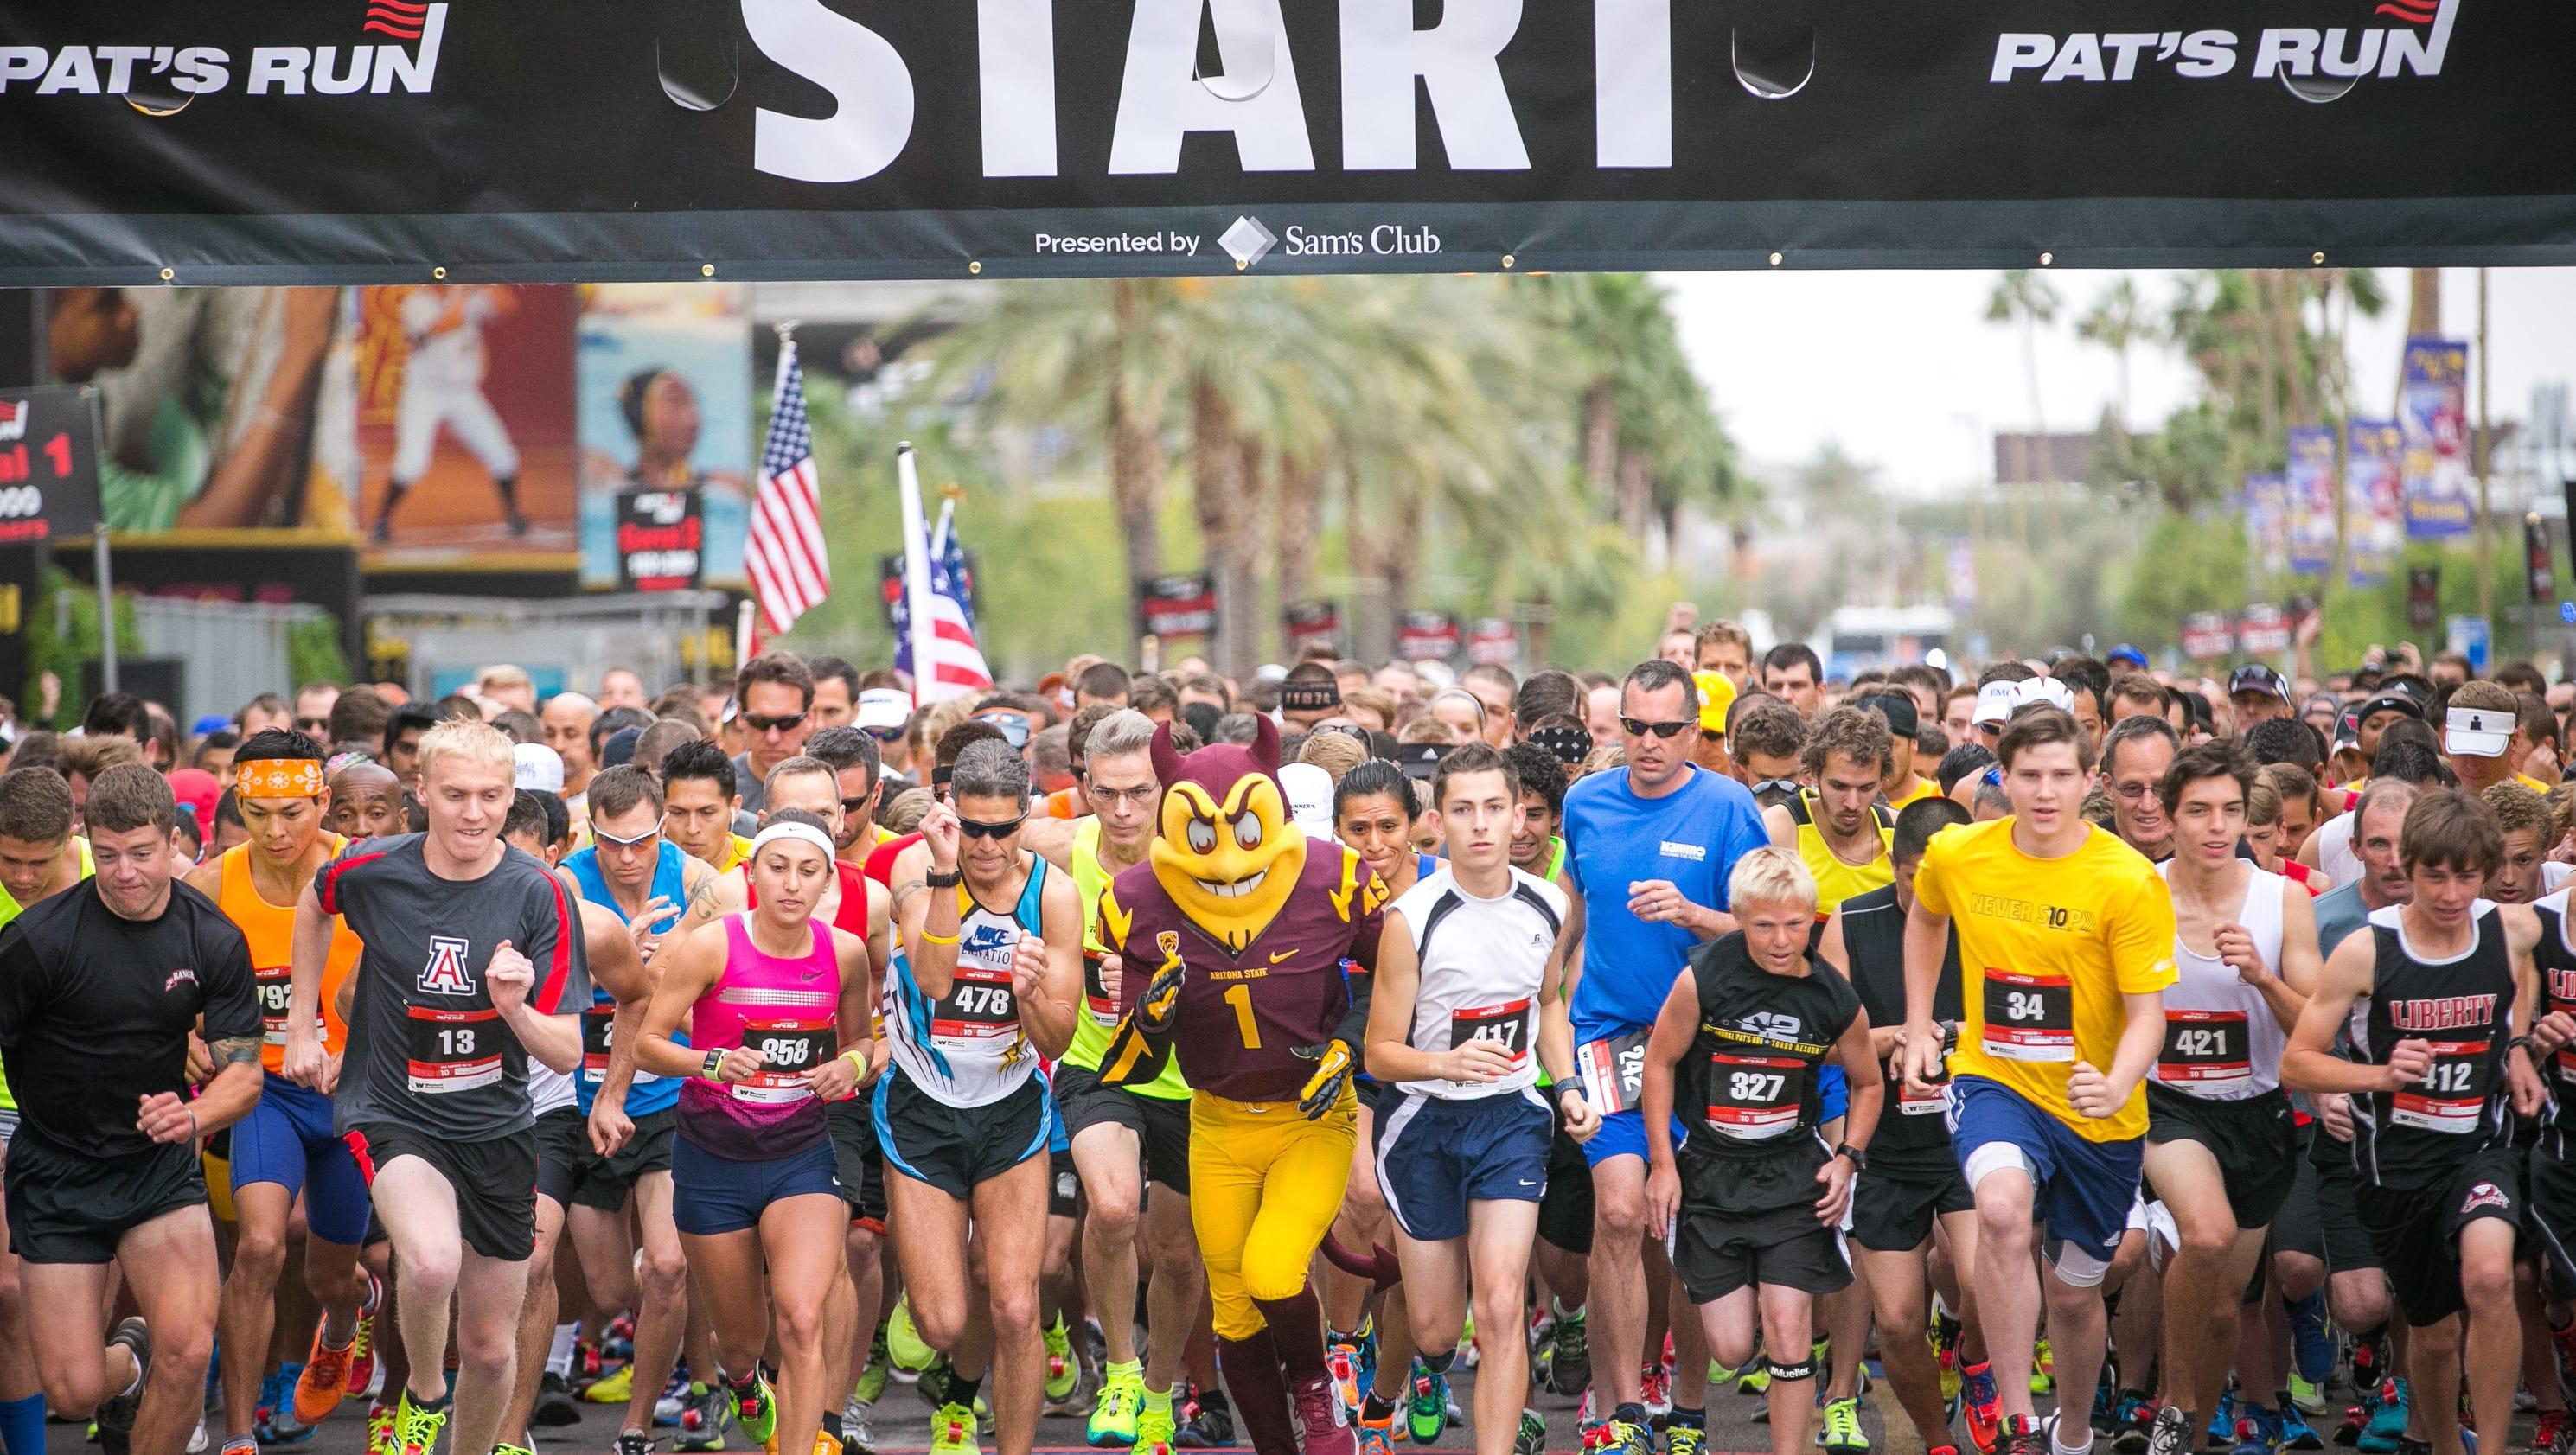 2015 Pat S Run Road Closures Schedule And More